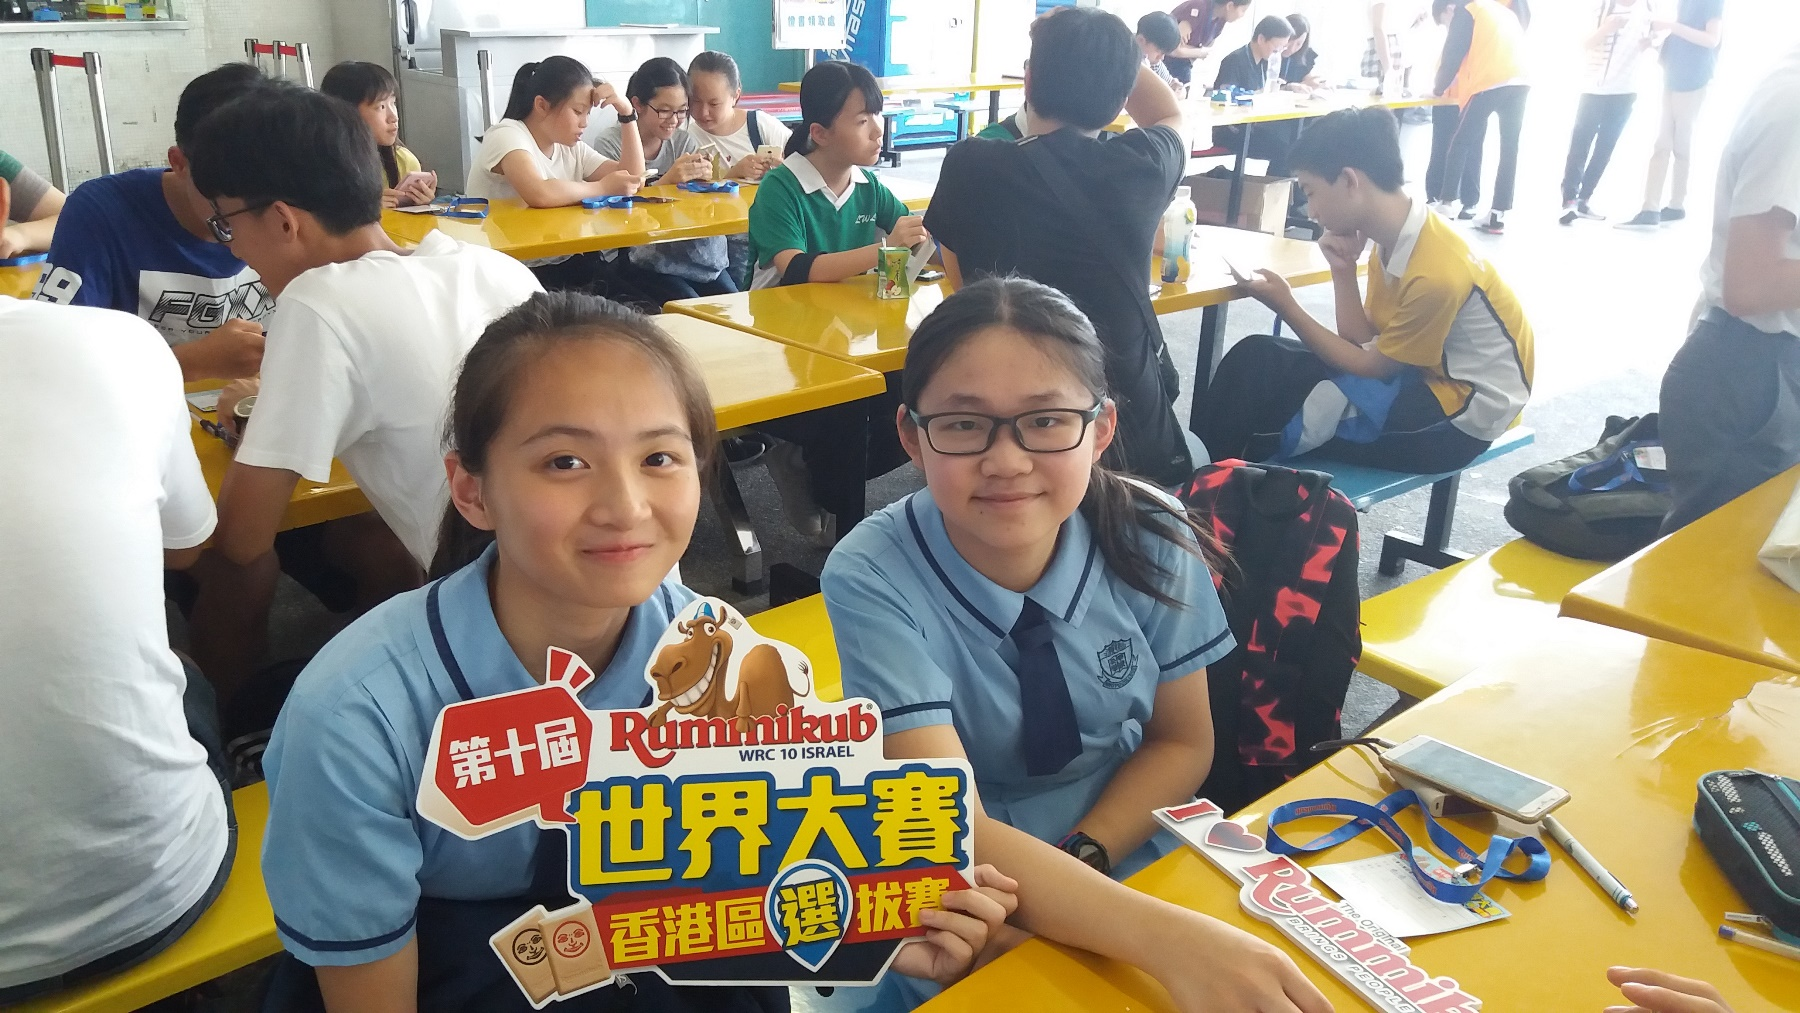 http://npc.edu.hk/sites/default/files/20180519_132726.jpg